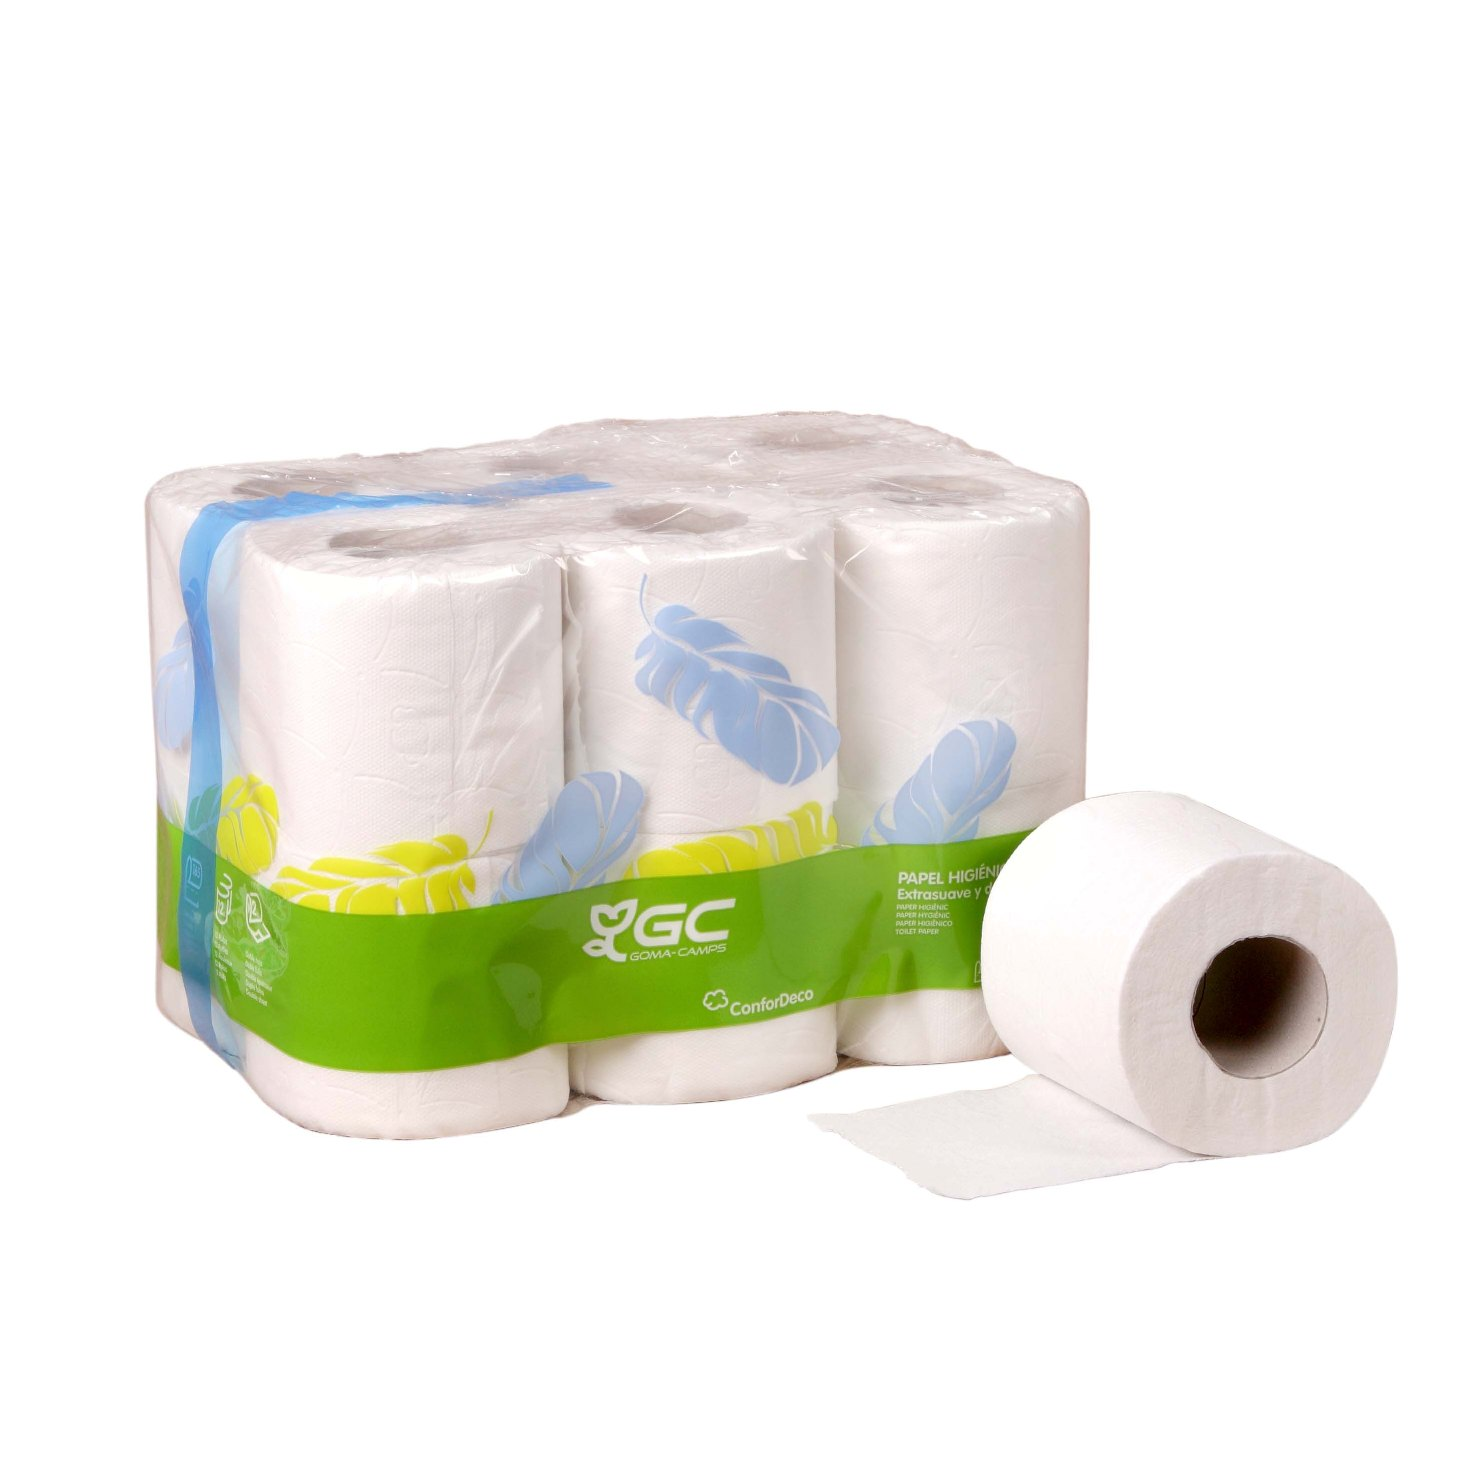 Papel higienico dom stico 108 rollos cimetres for Accesorios para bano papel higienico